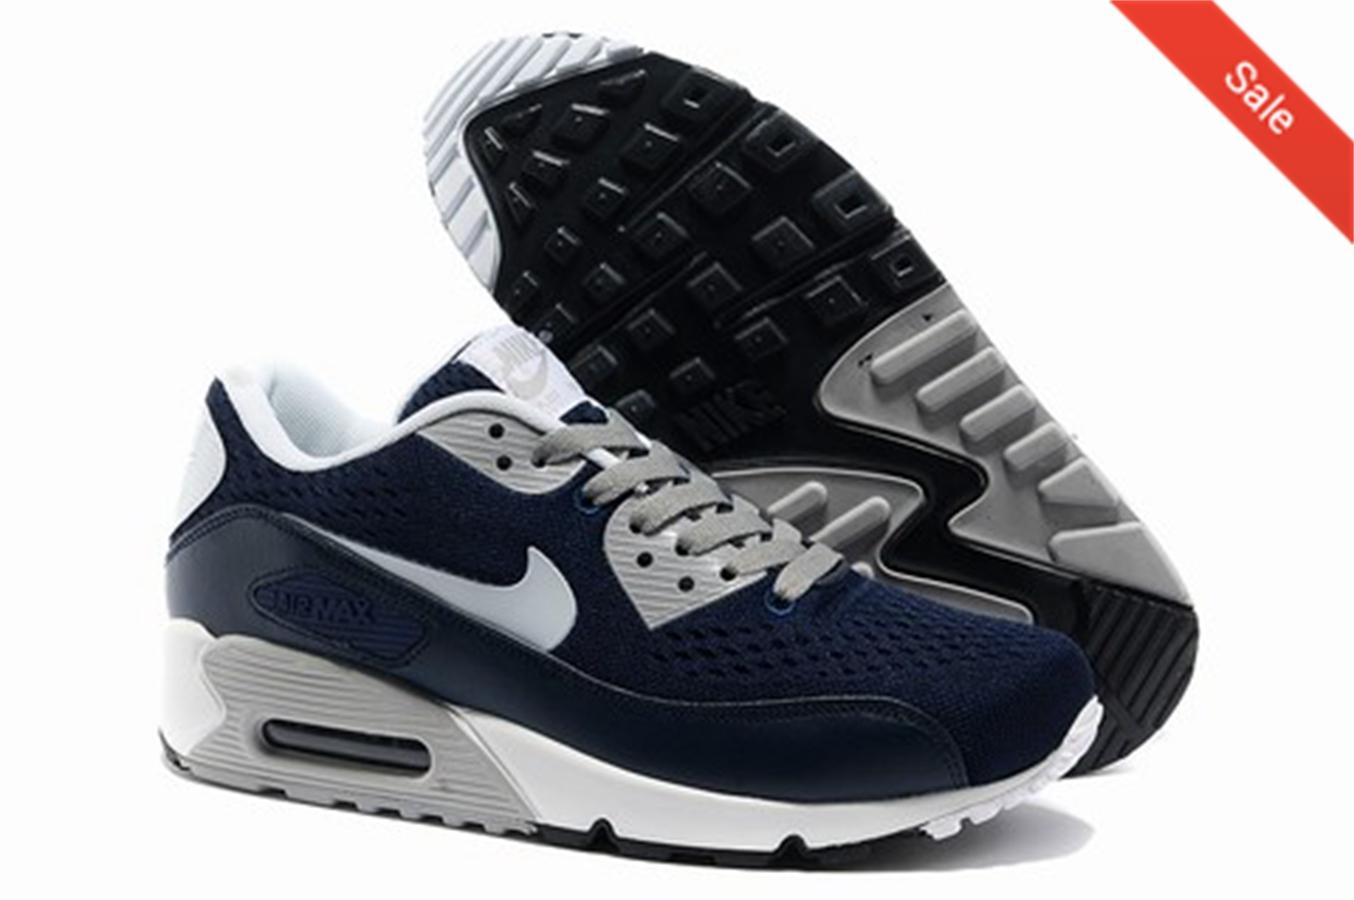 best loved bcc2d ceea1 Nike - Air Max 90 Premium Se - 858954-002 - Age - Adulte, Couleur - Gris,  Genre - Homme, Taille - 39 - pas cher Achat   Vente Chaussures basket - .